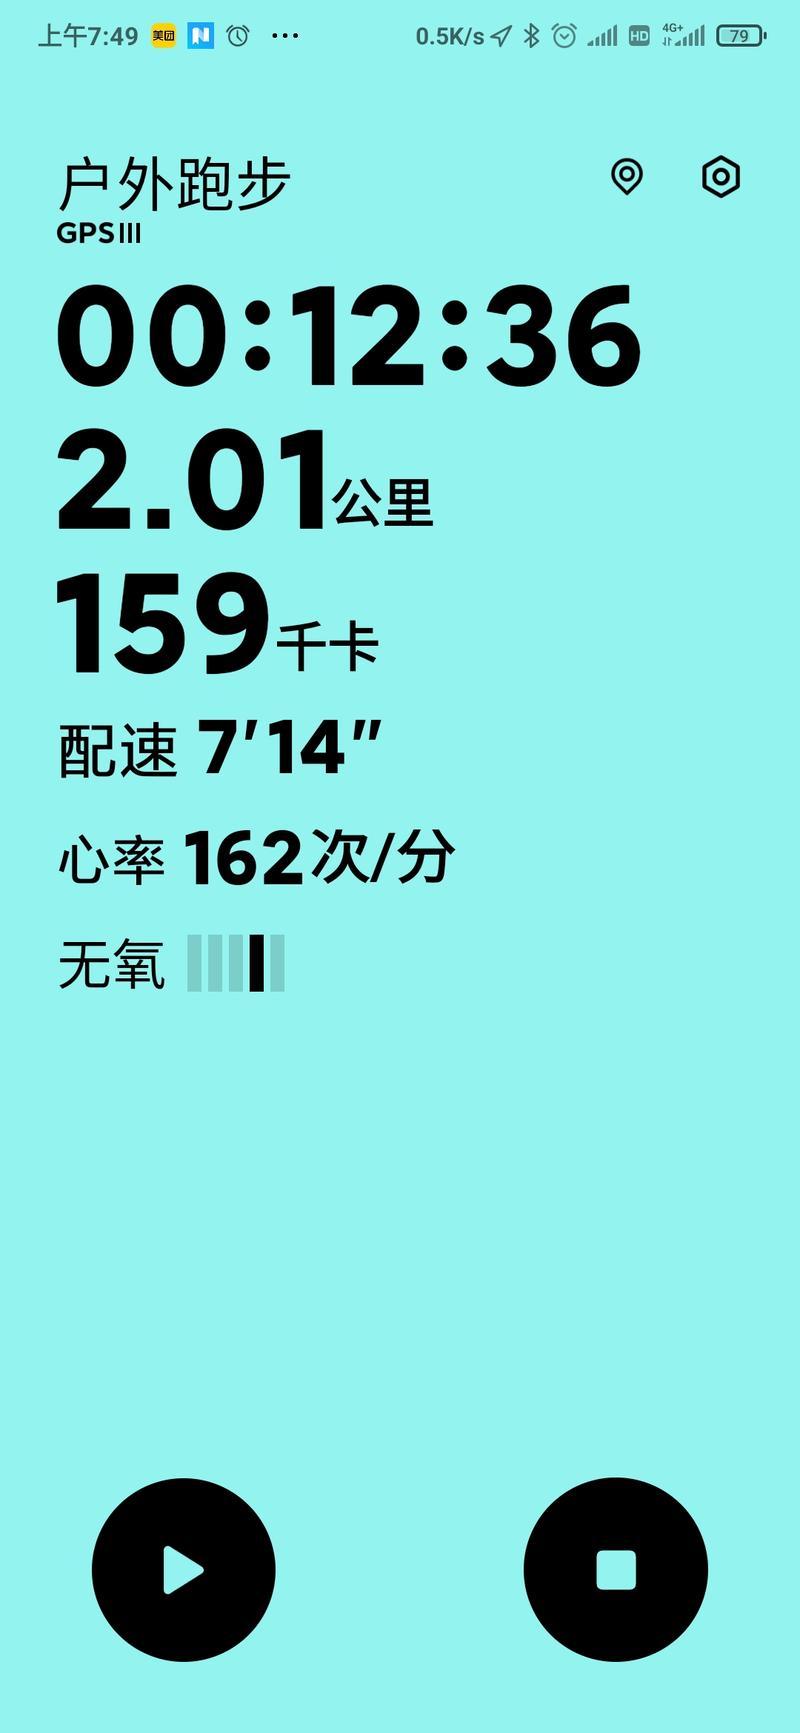 last_order于2021-09-10 08:42发布的图片